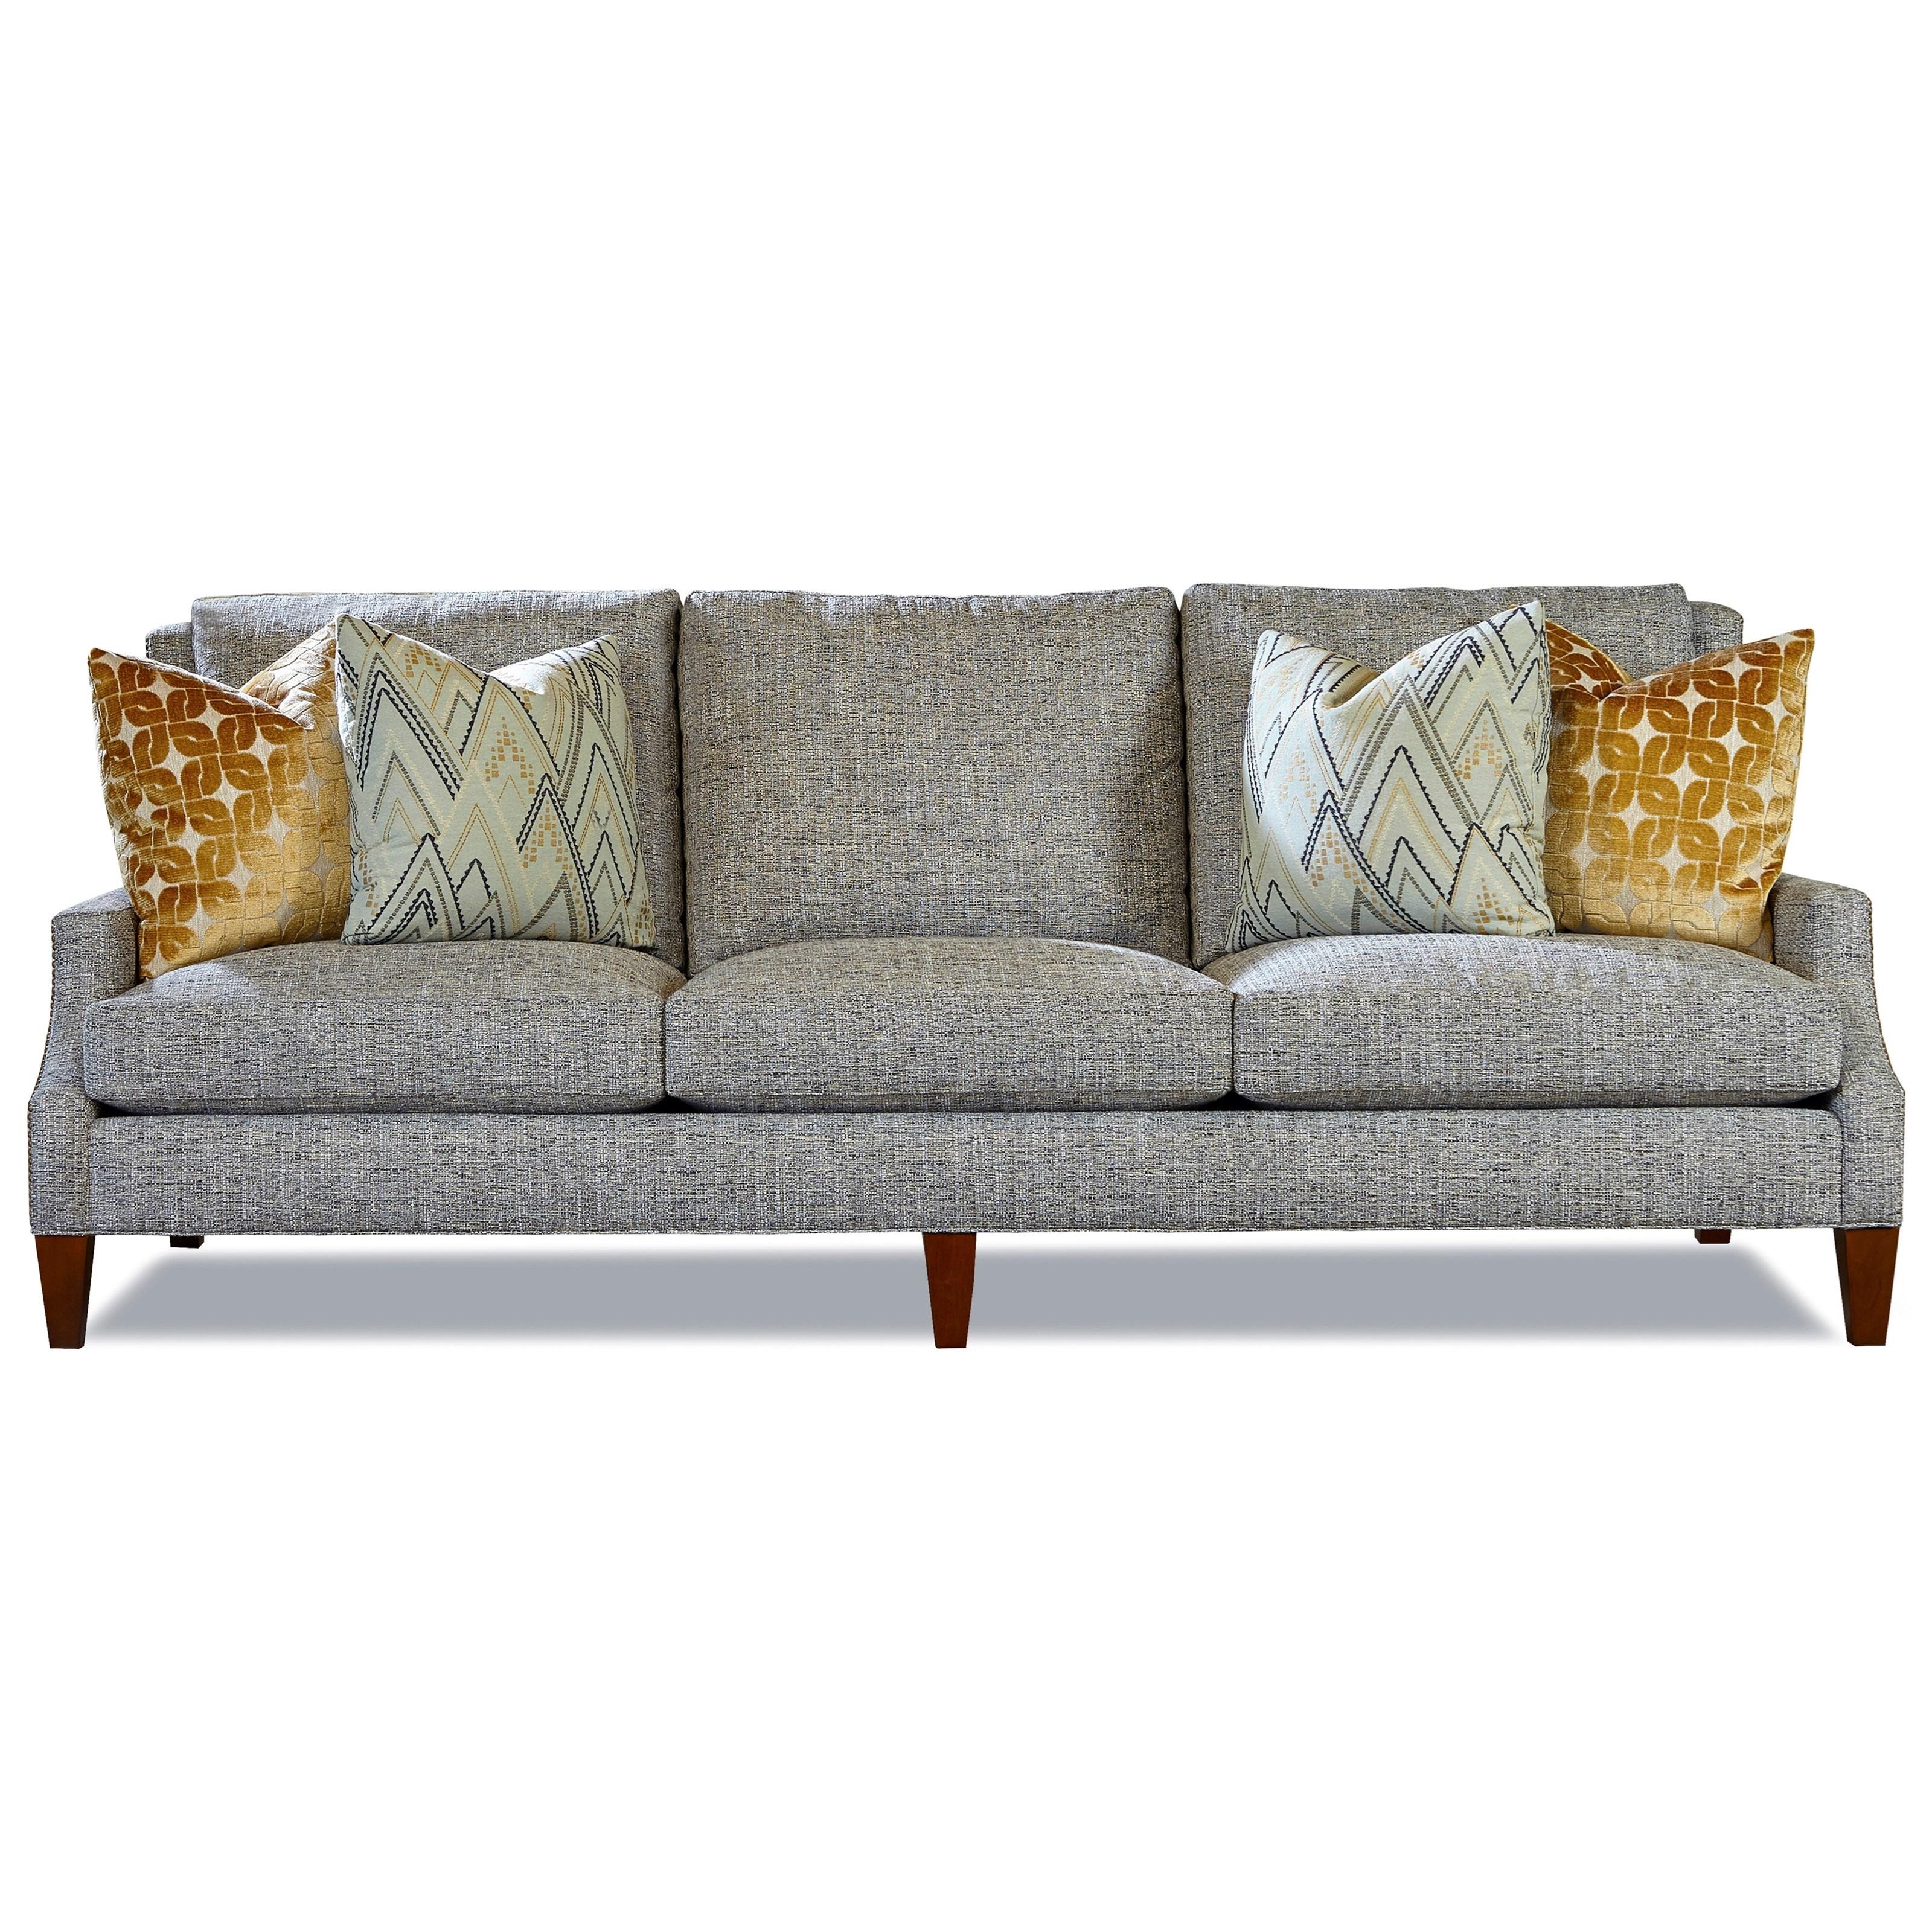 7281 Sofa by Geoffrey Alexander at Sprintz Furniture